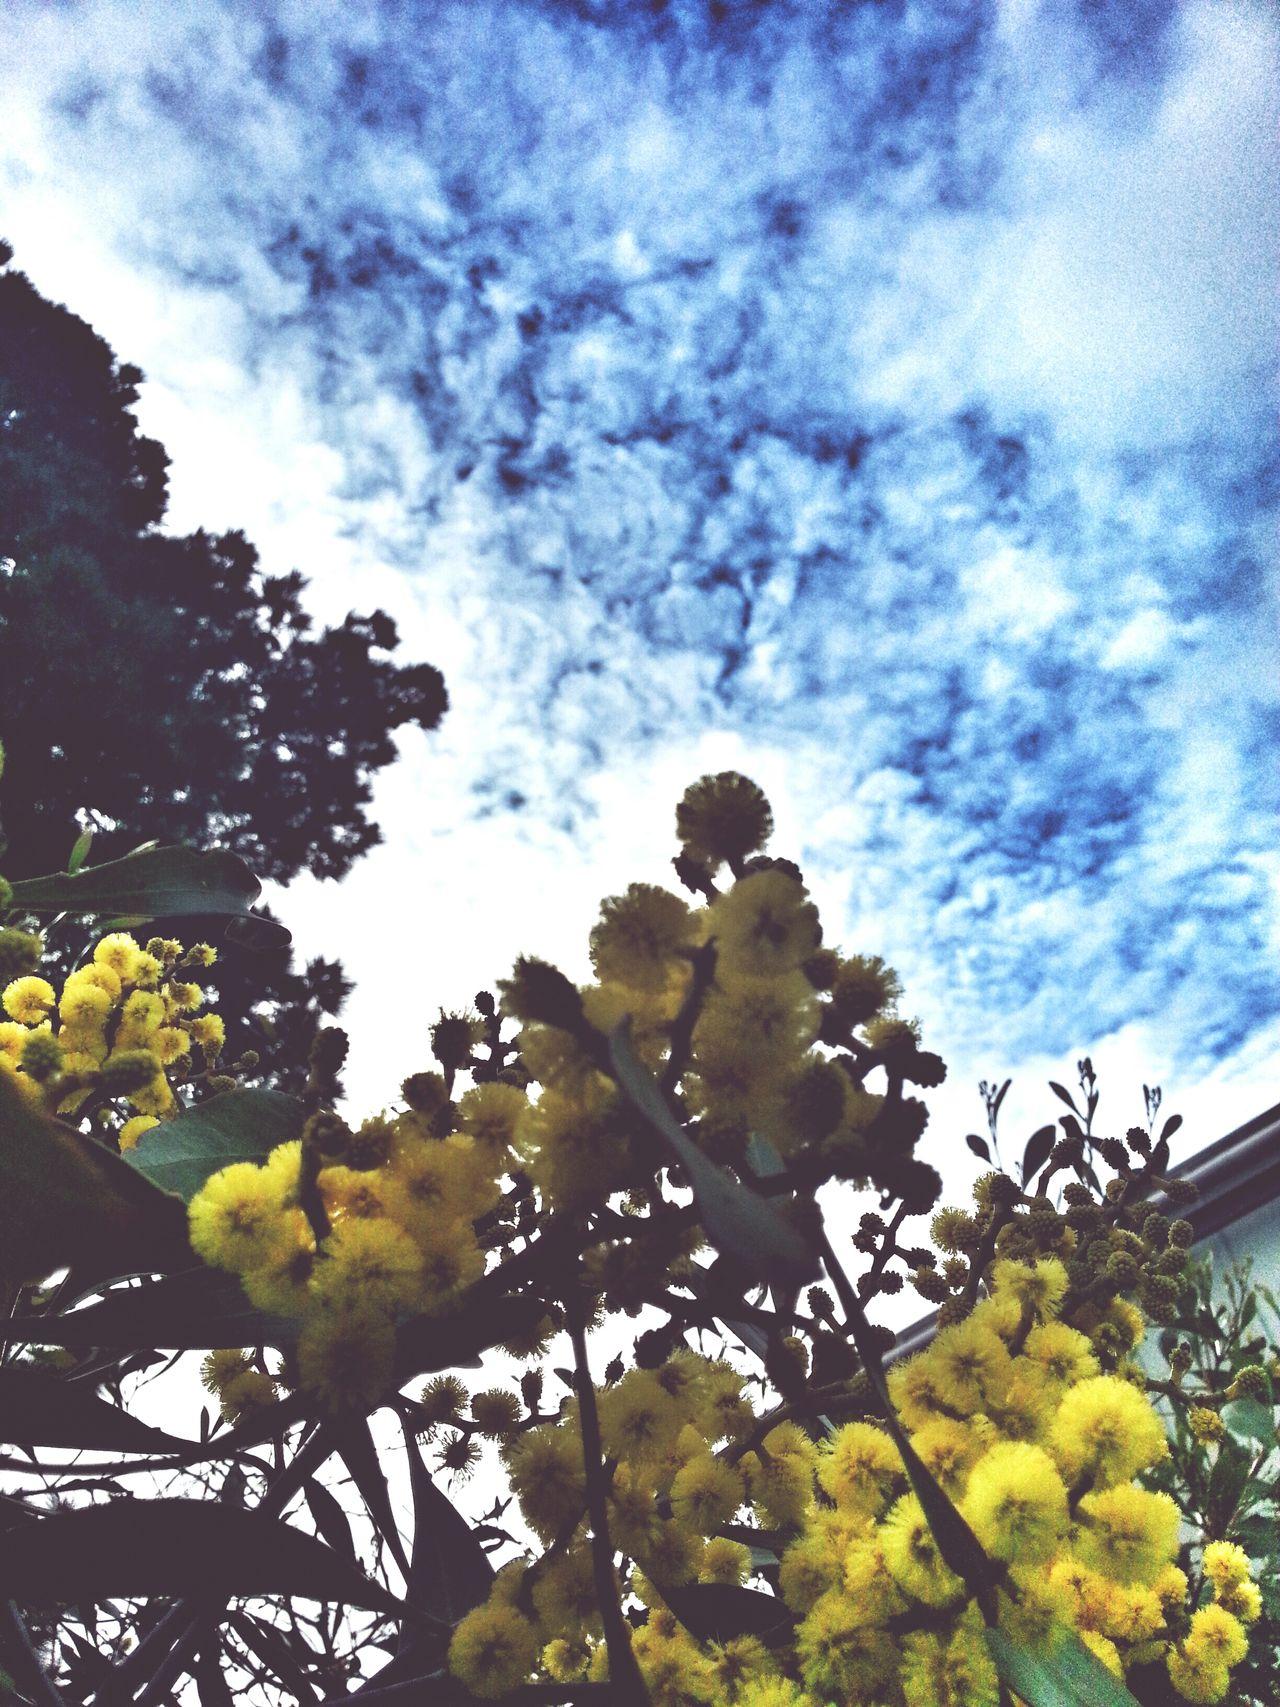 Native Golden wattle tree in full winter bloom. Melbourne EyeEm Melbourne Victoria, Australia Eyeem Australia Snapseed My Perspective Australia Winter Blooms Flowers,Plants & Garden EyeEm Best Shots - Nature